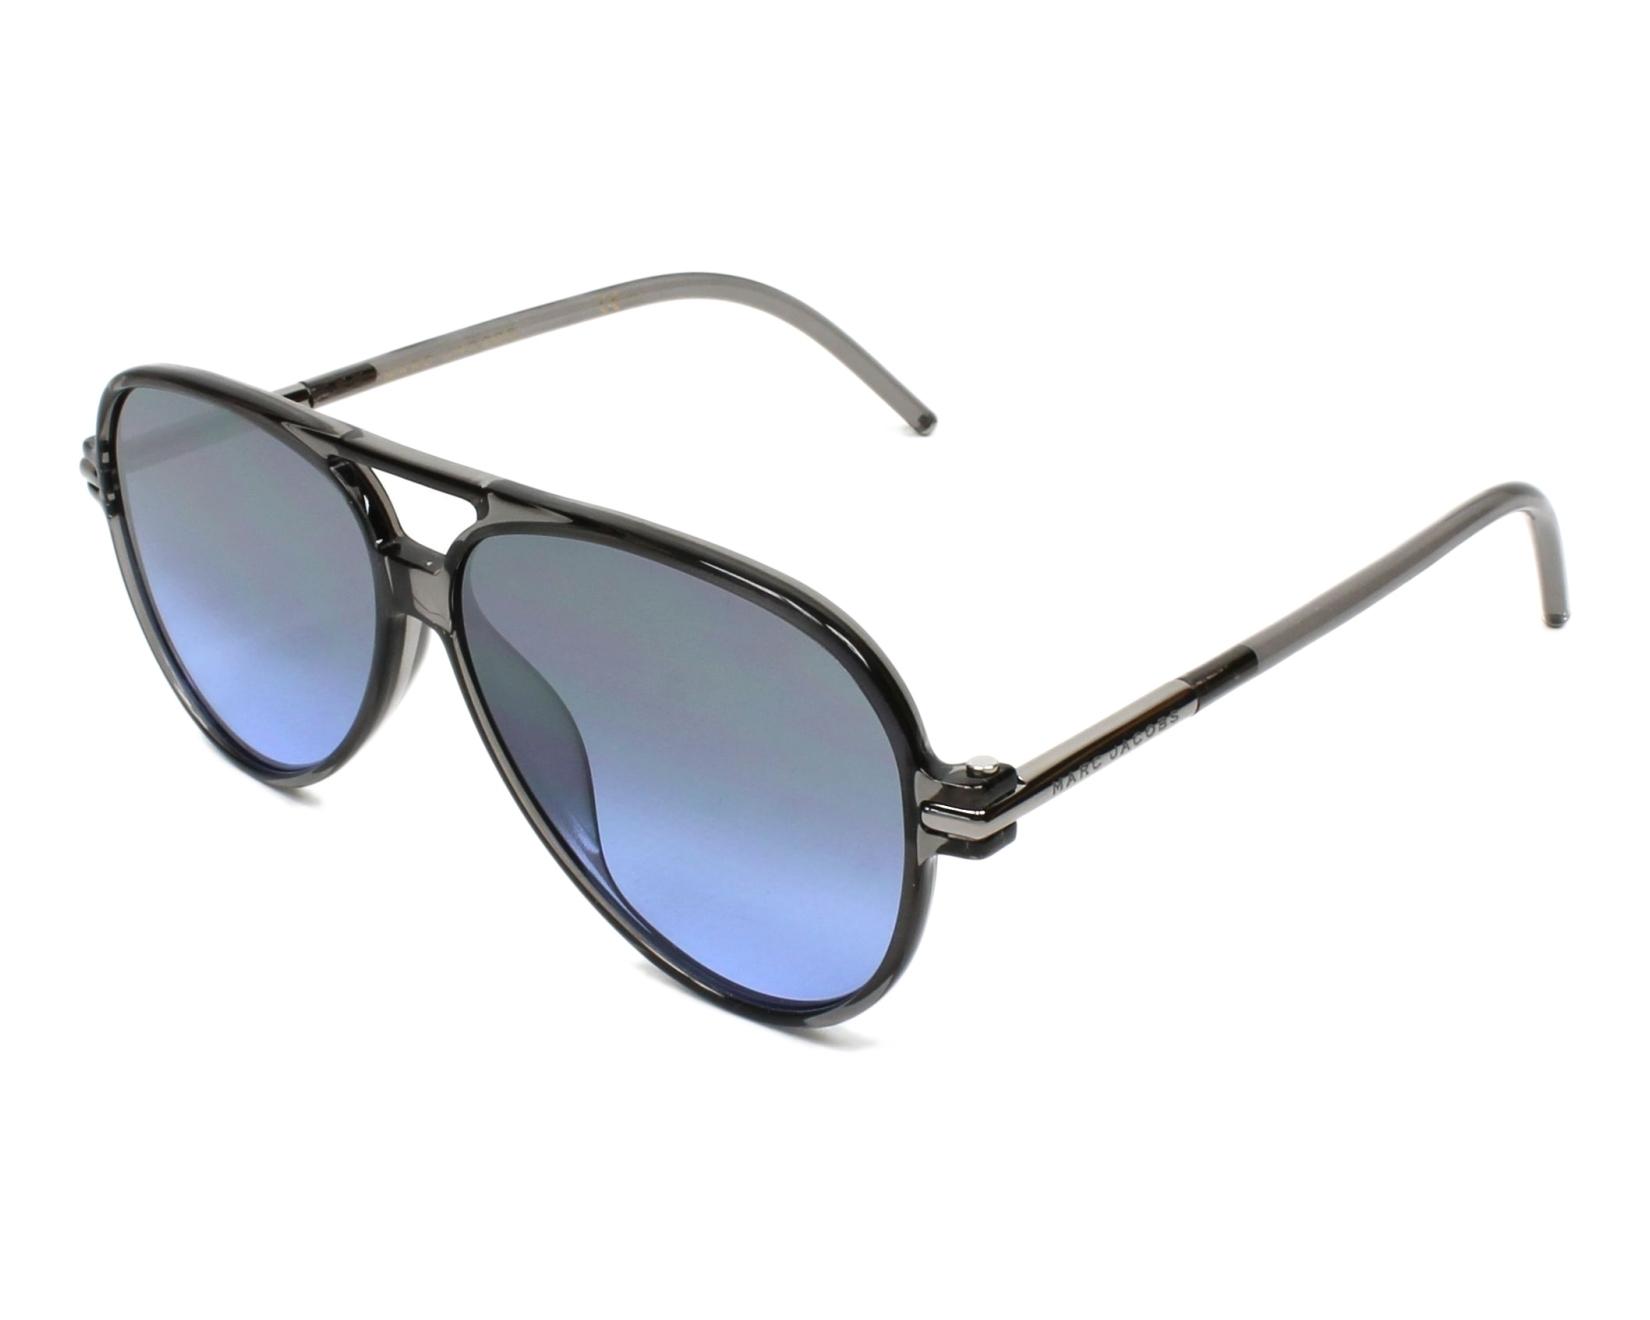 Sunglasses Marc Jacobs MARC-44-S TME I5 56-11 Grey Silver d166929acf6d